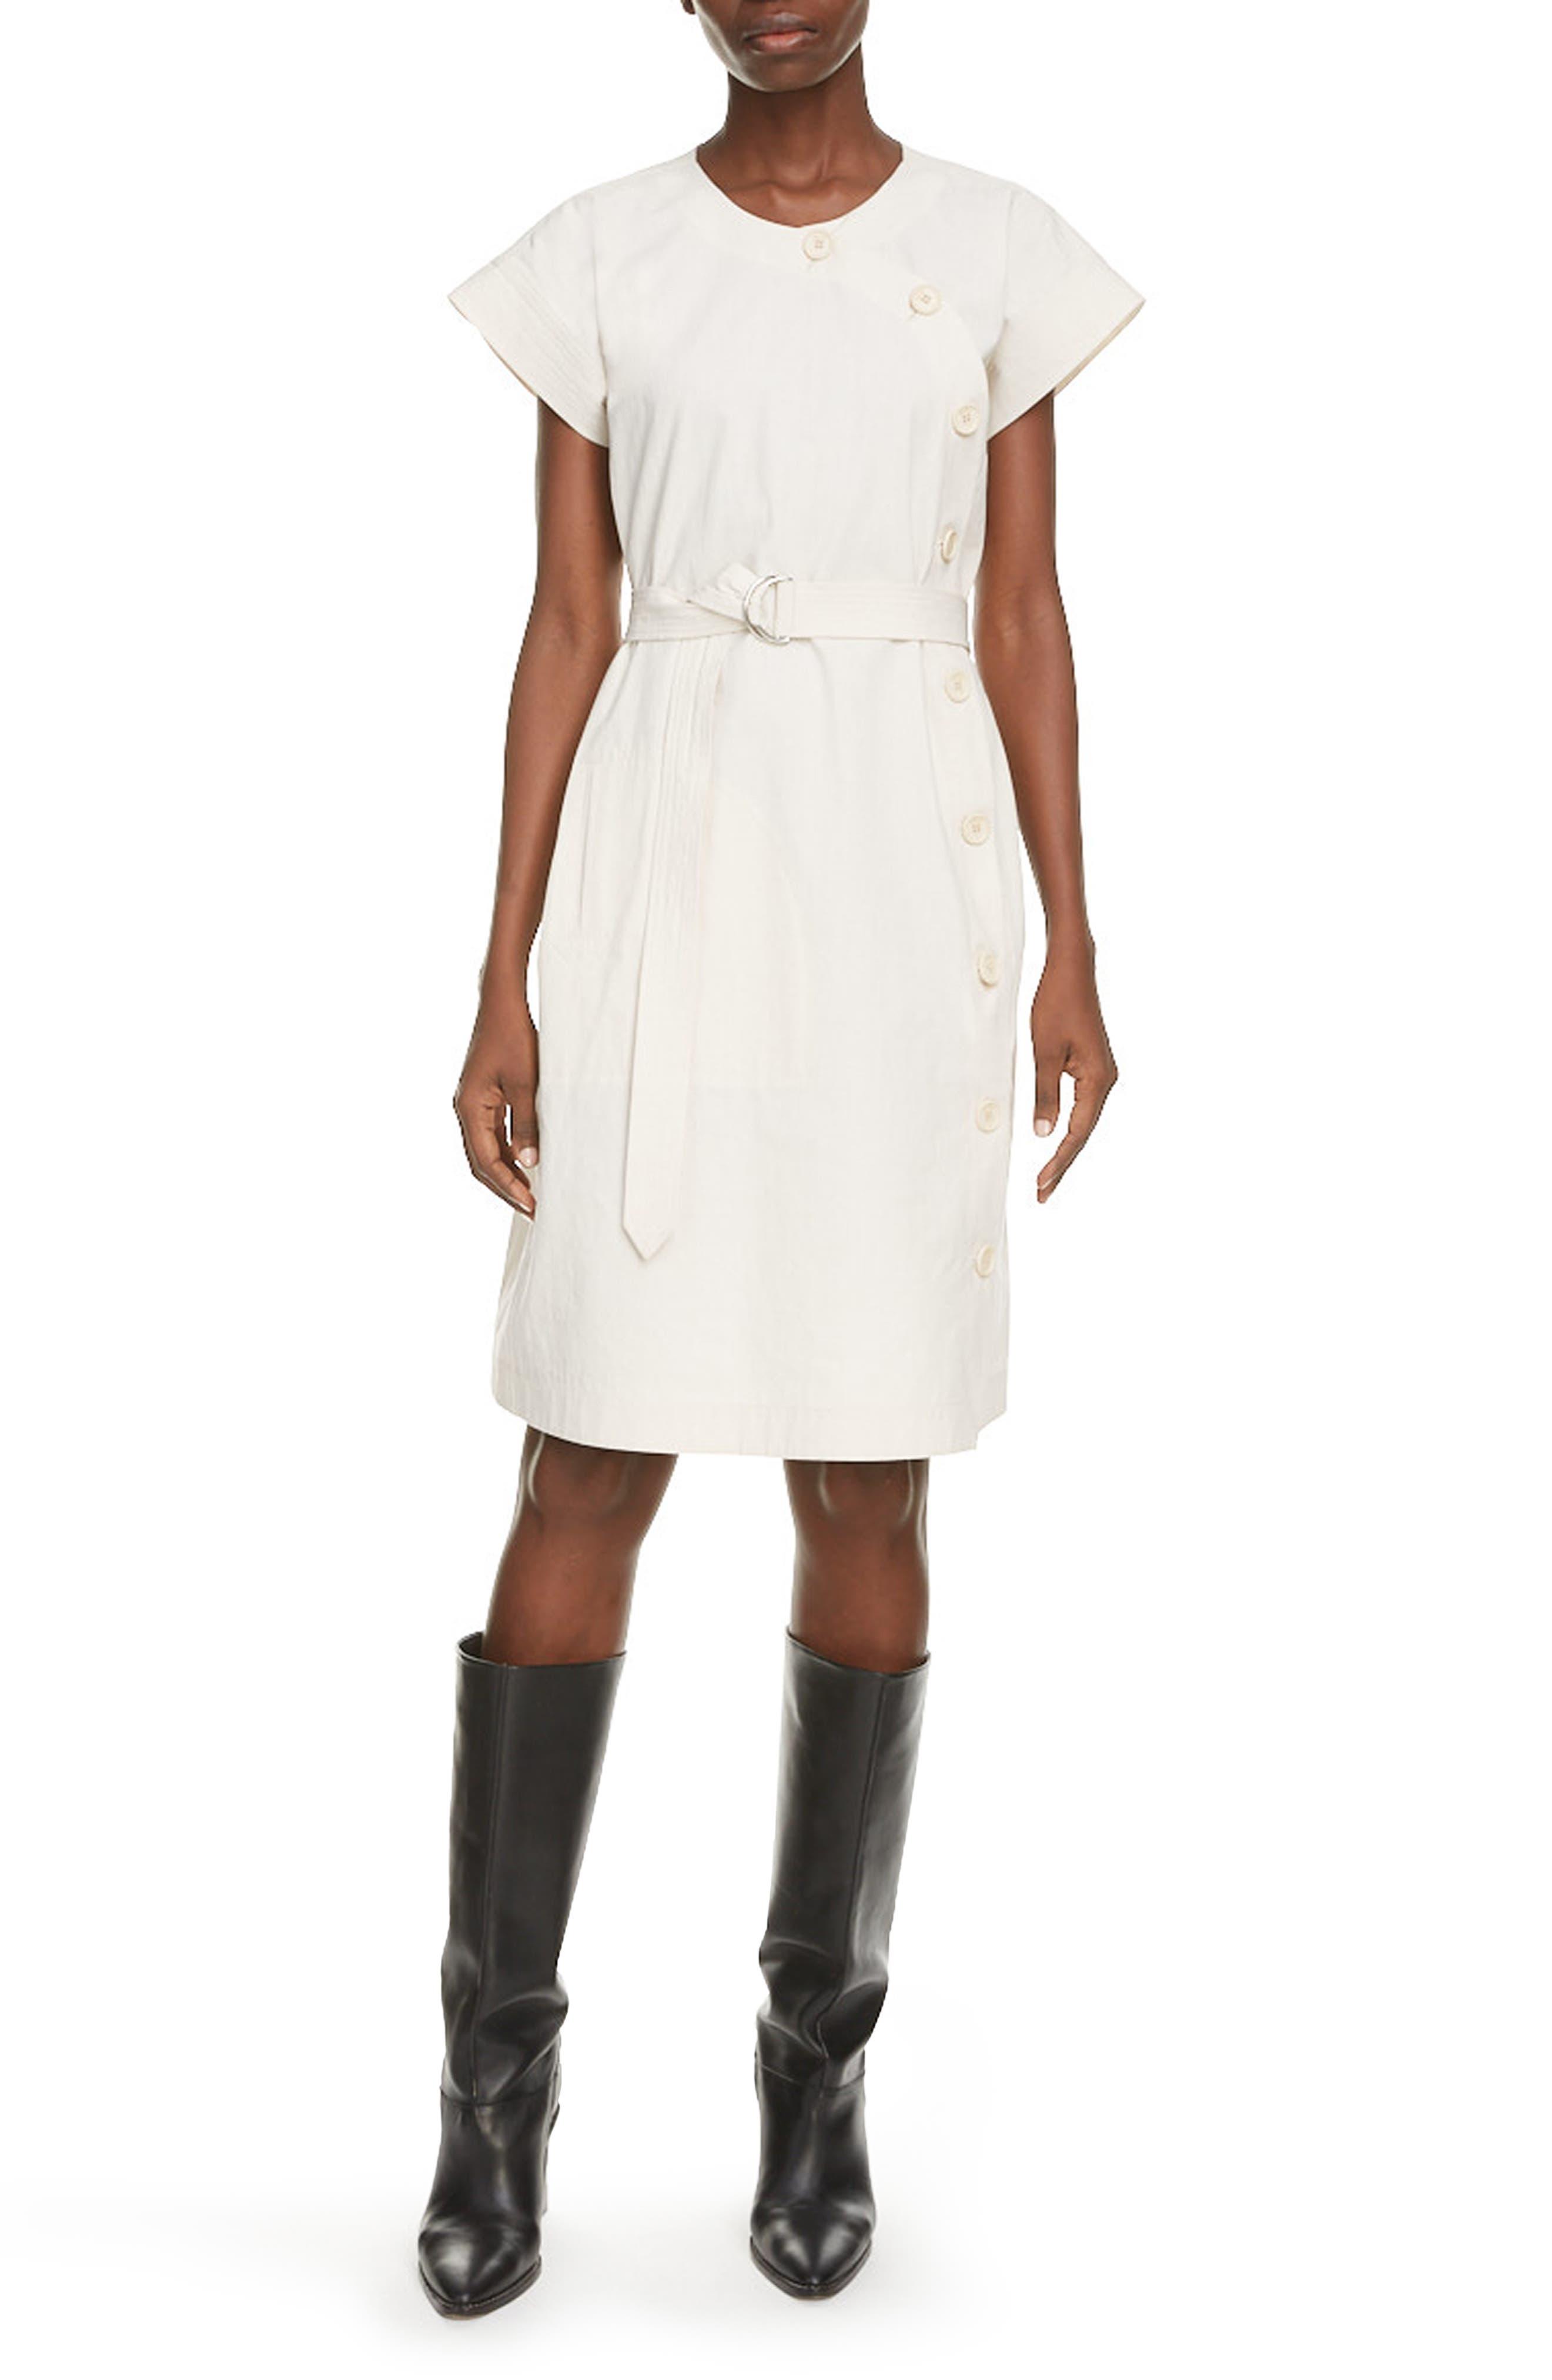 KENZO Belted Cotton Dress   Nordstrom